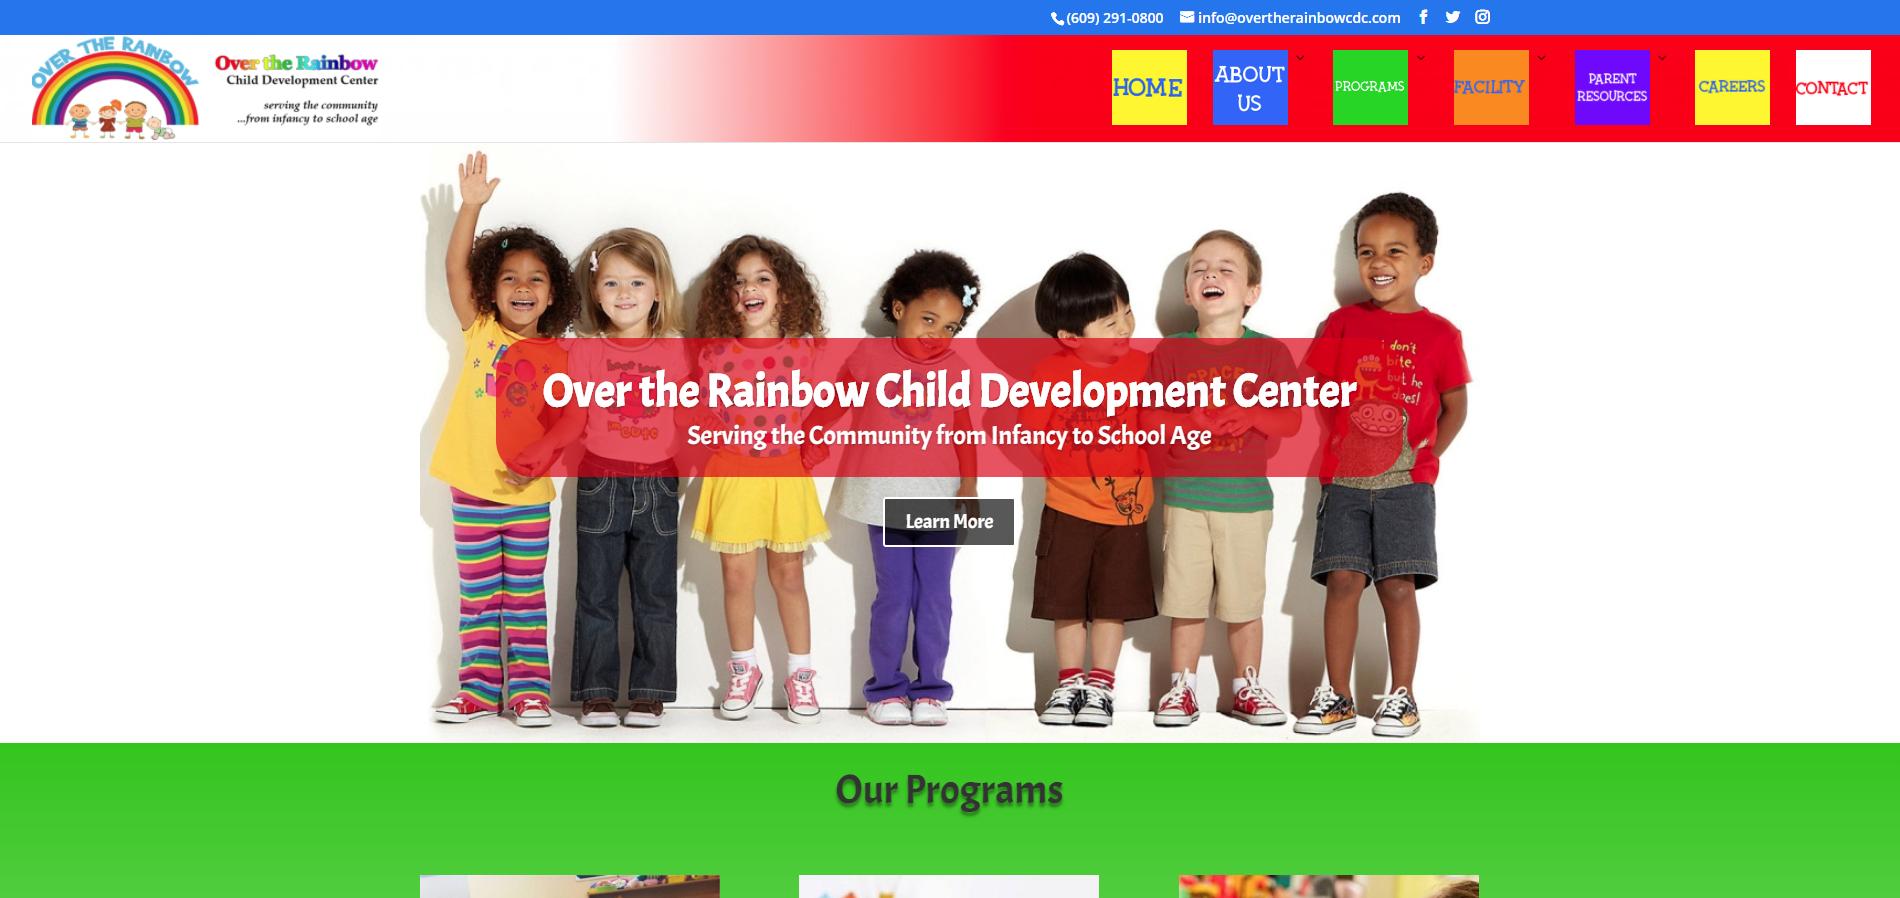 Recent Website Projects for DigitalEffex Web Hosting & Design in Pensacola, FL